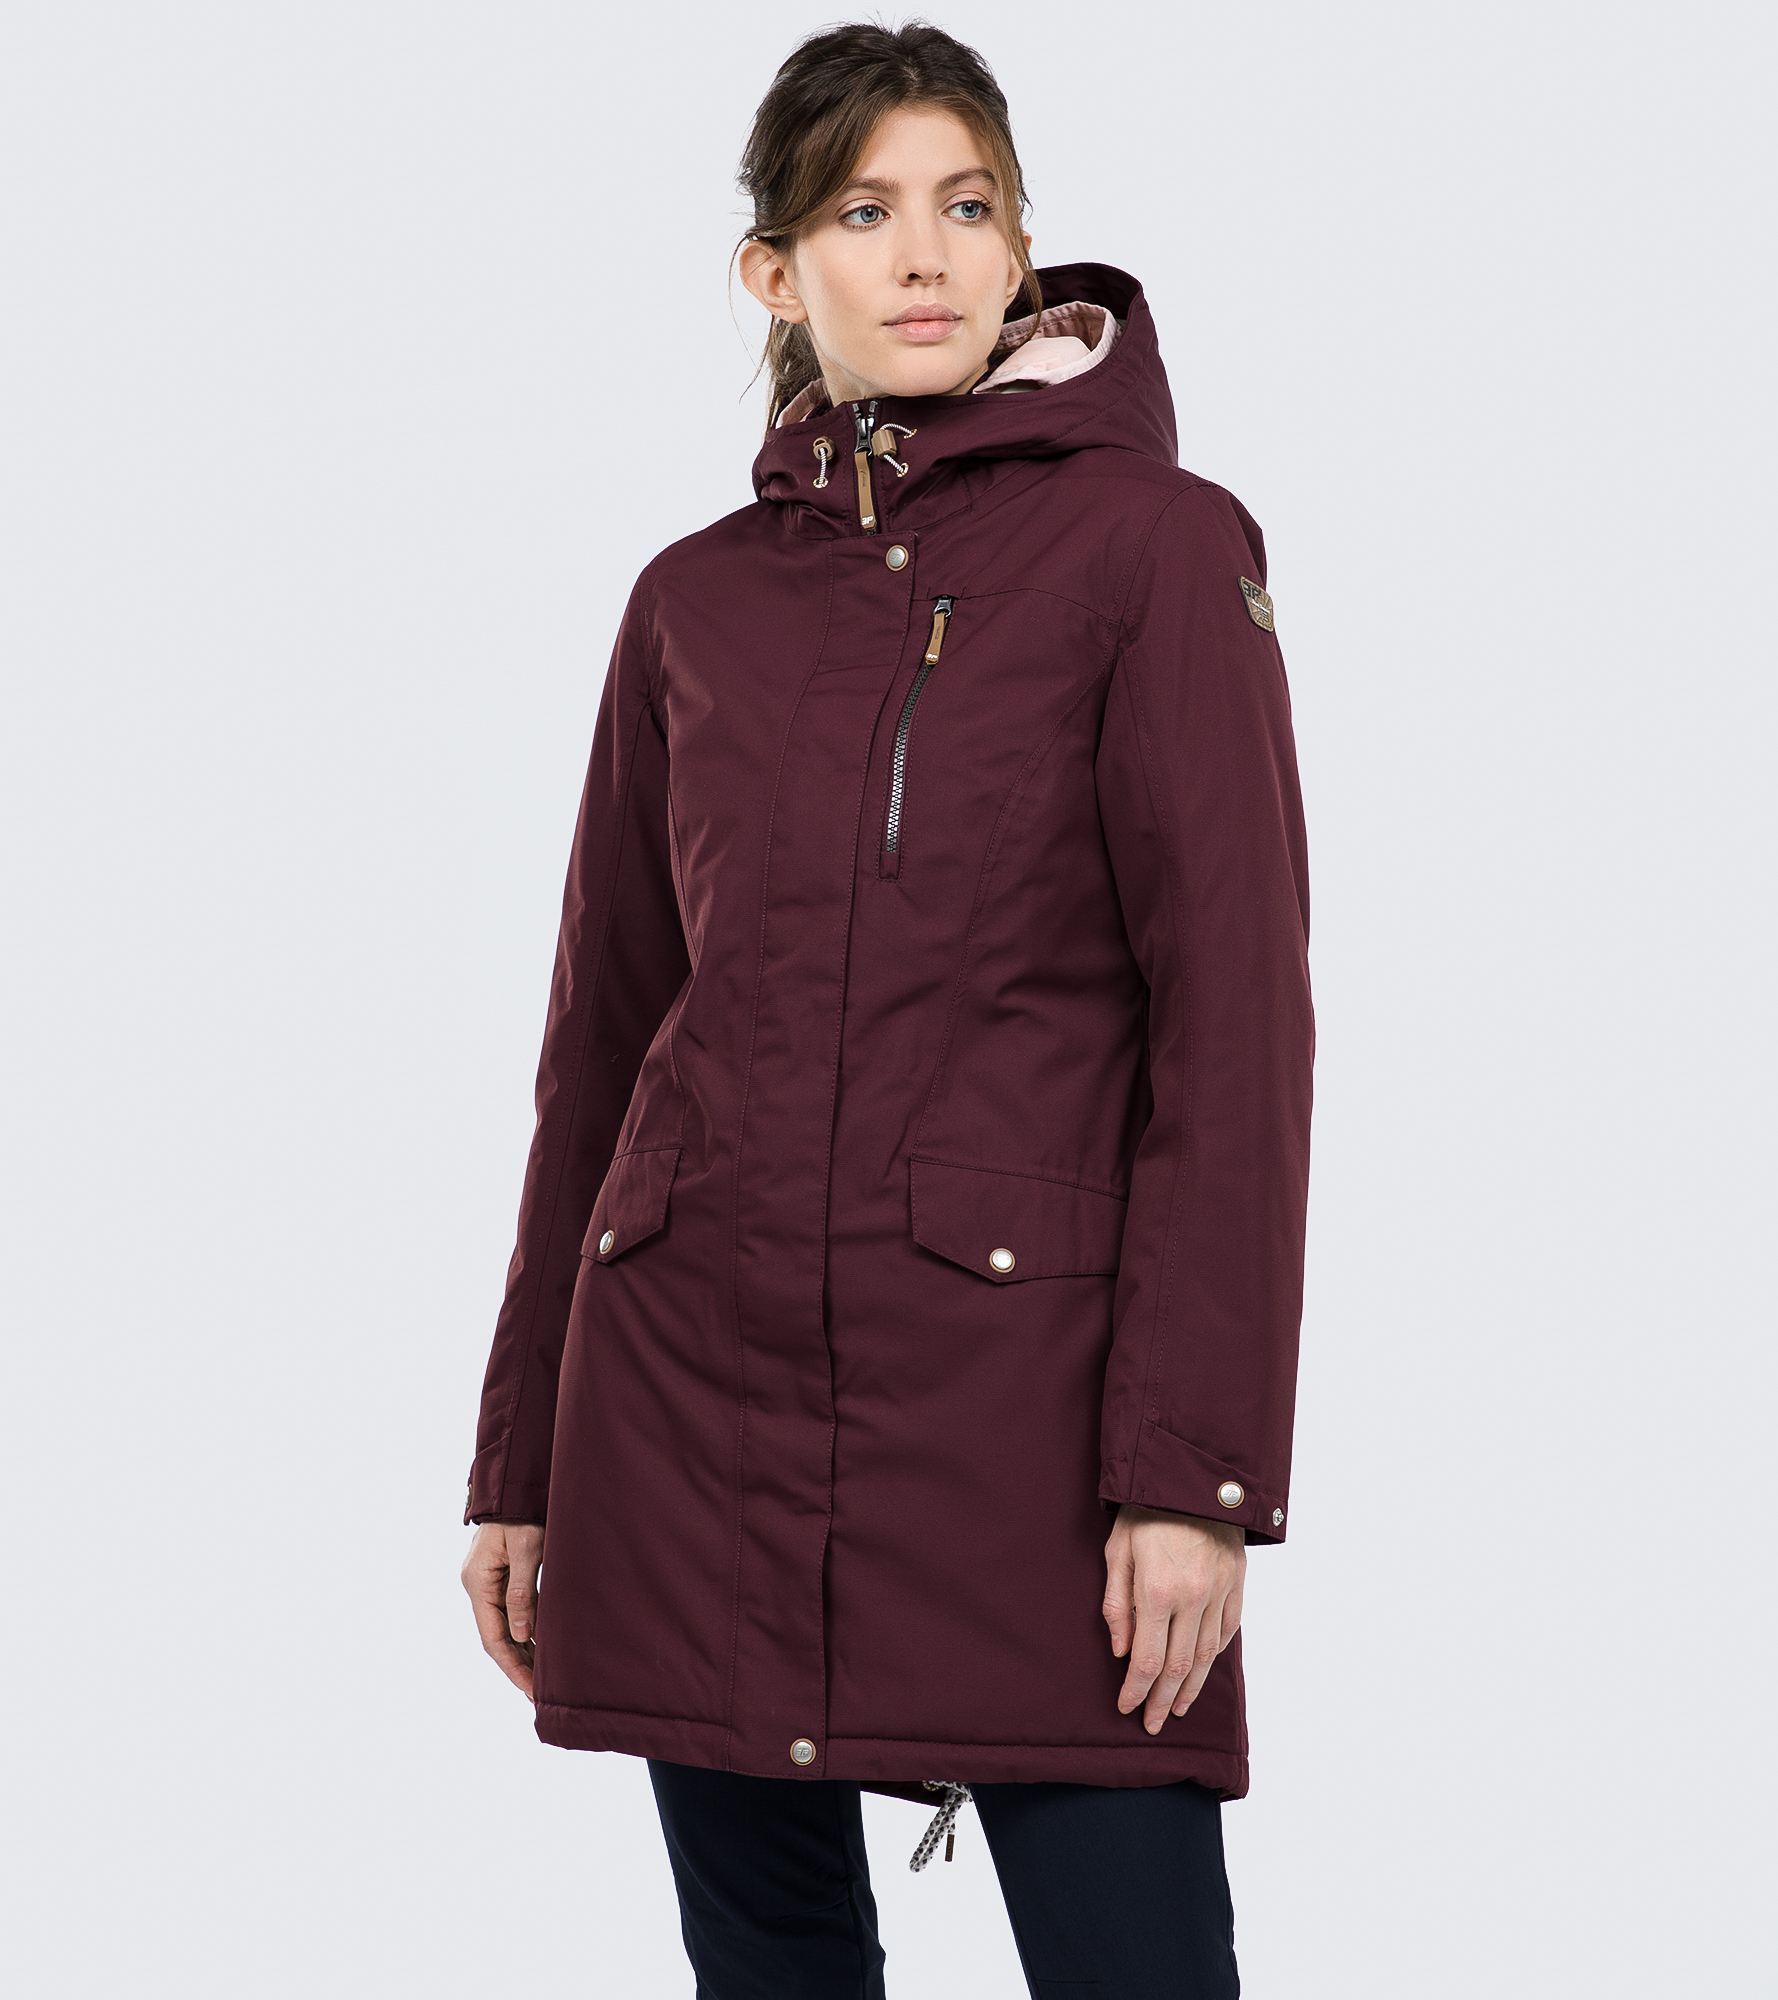 IcePeak Куртка утепленная женская IcePeak Adona, размер 52